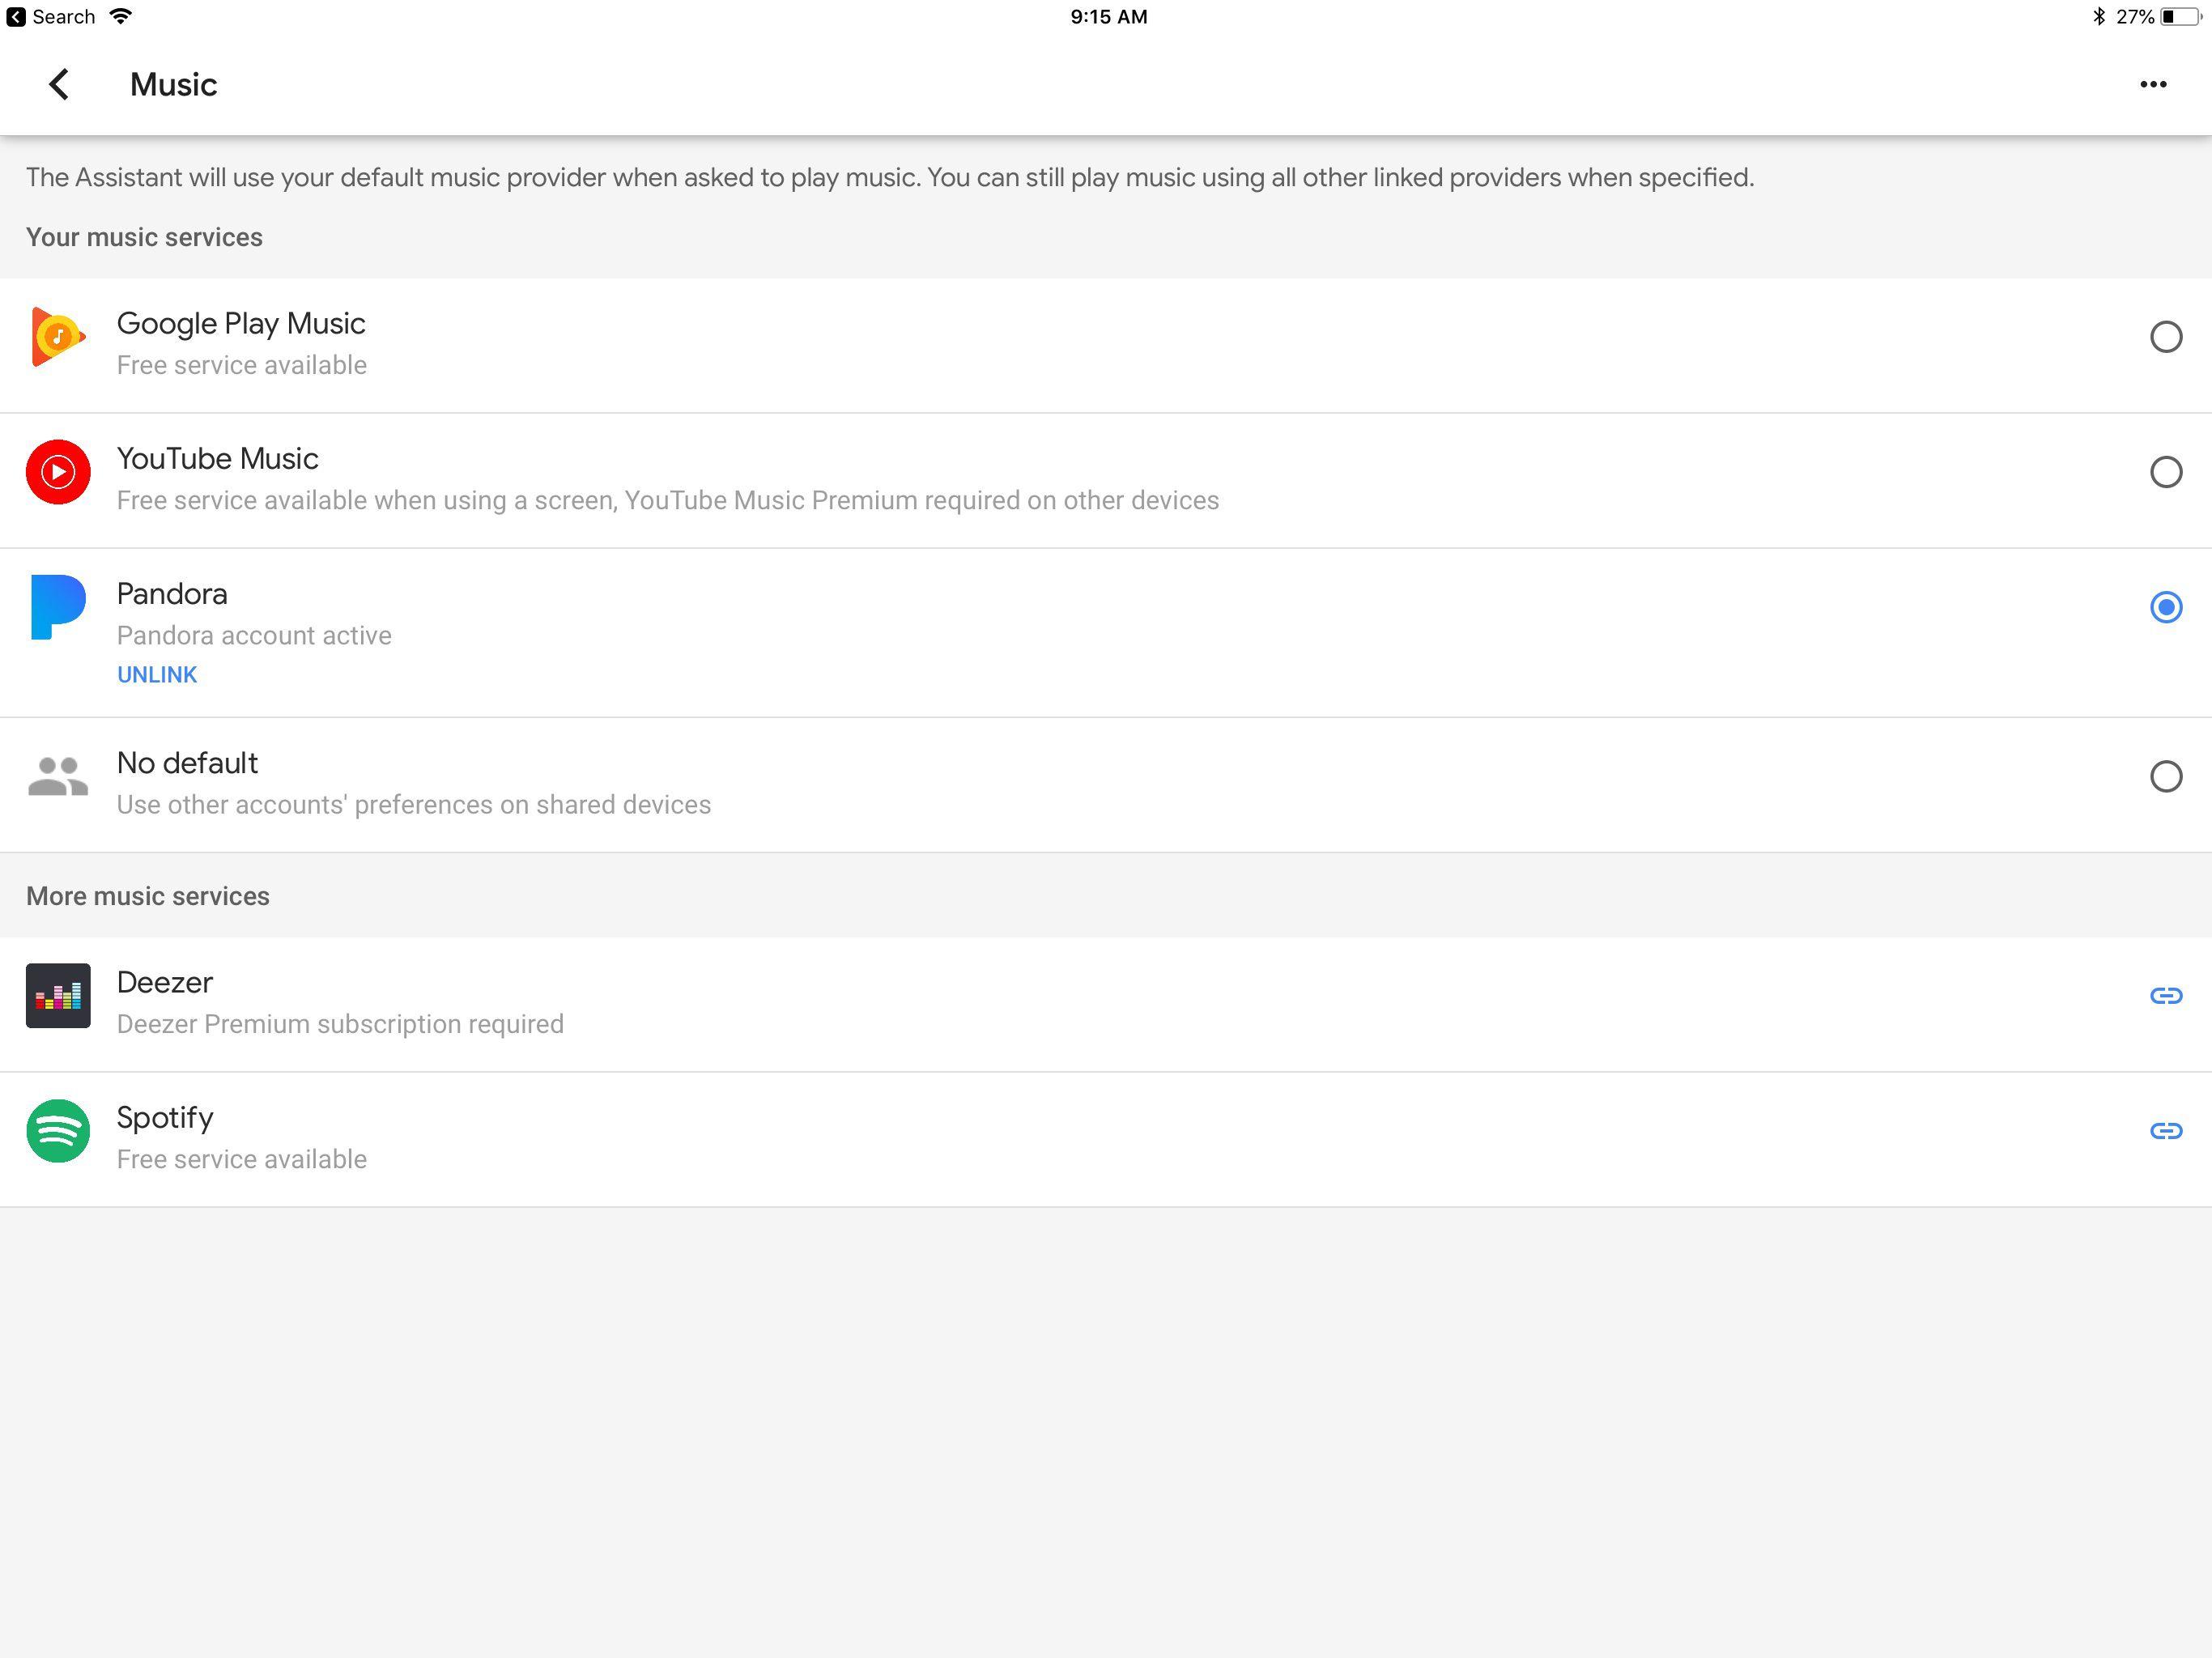 A screenshot of Google Home music settings